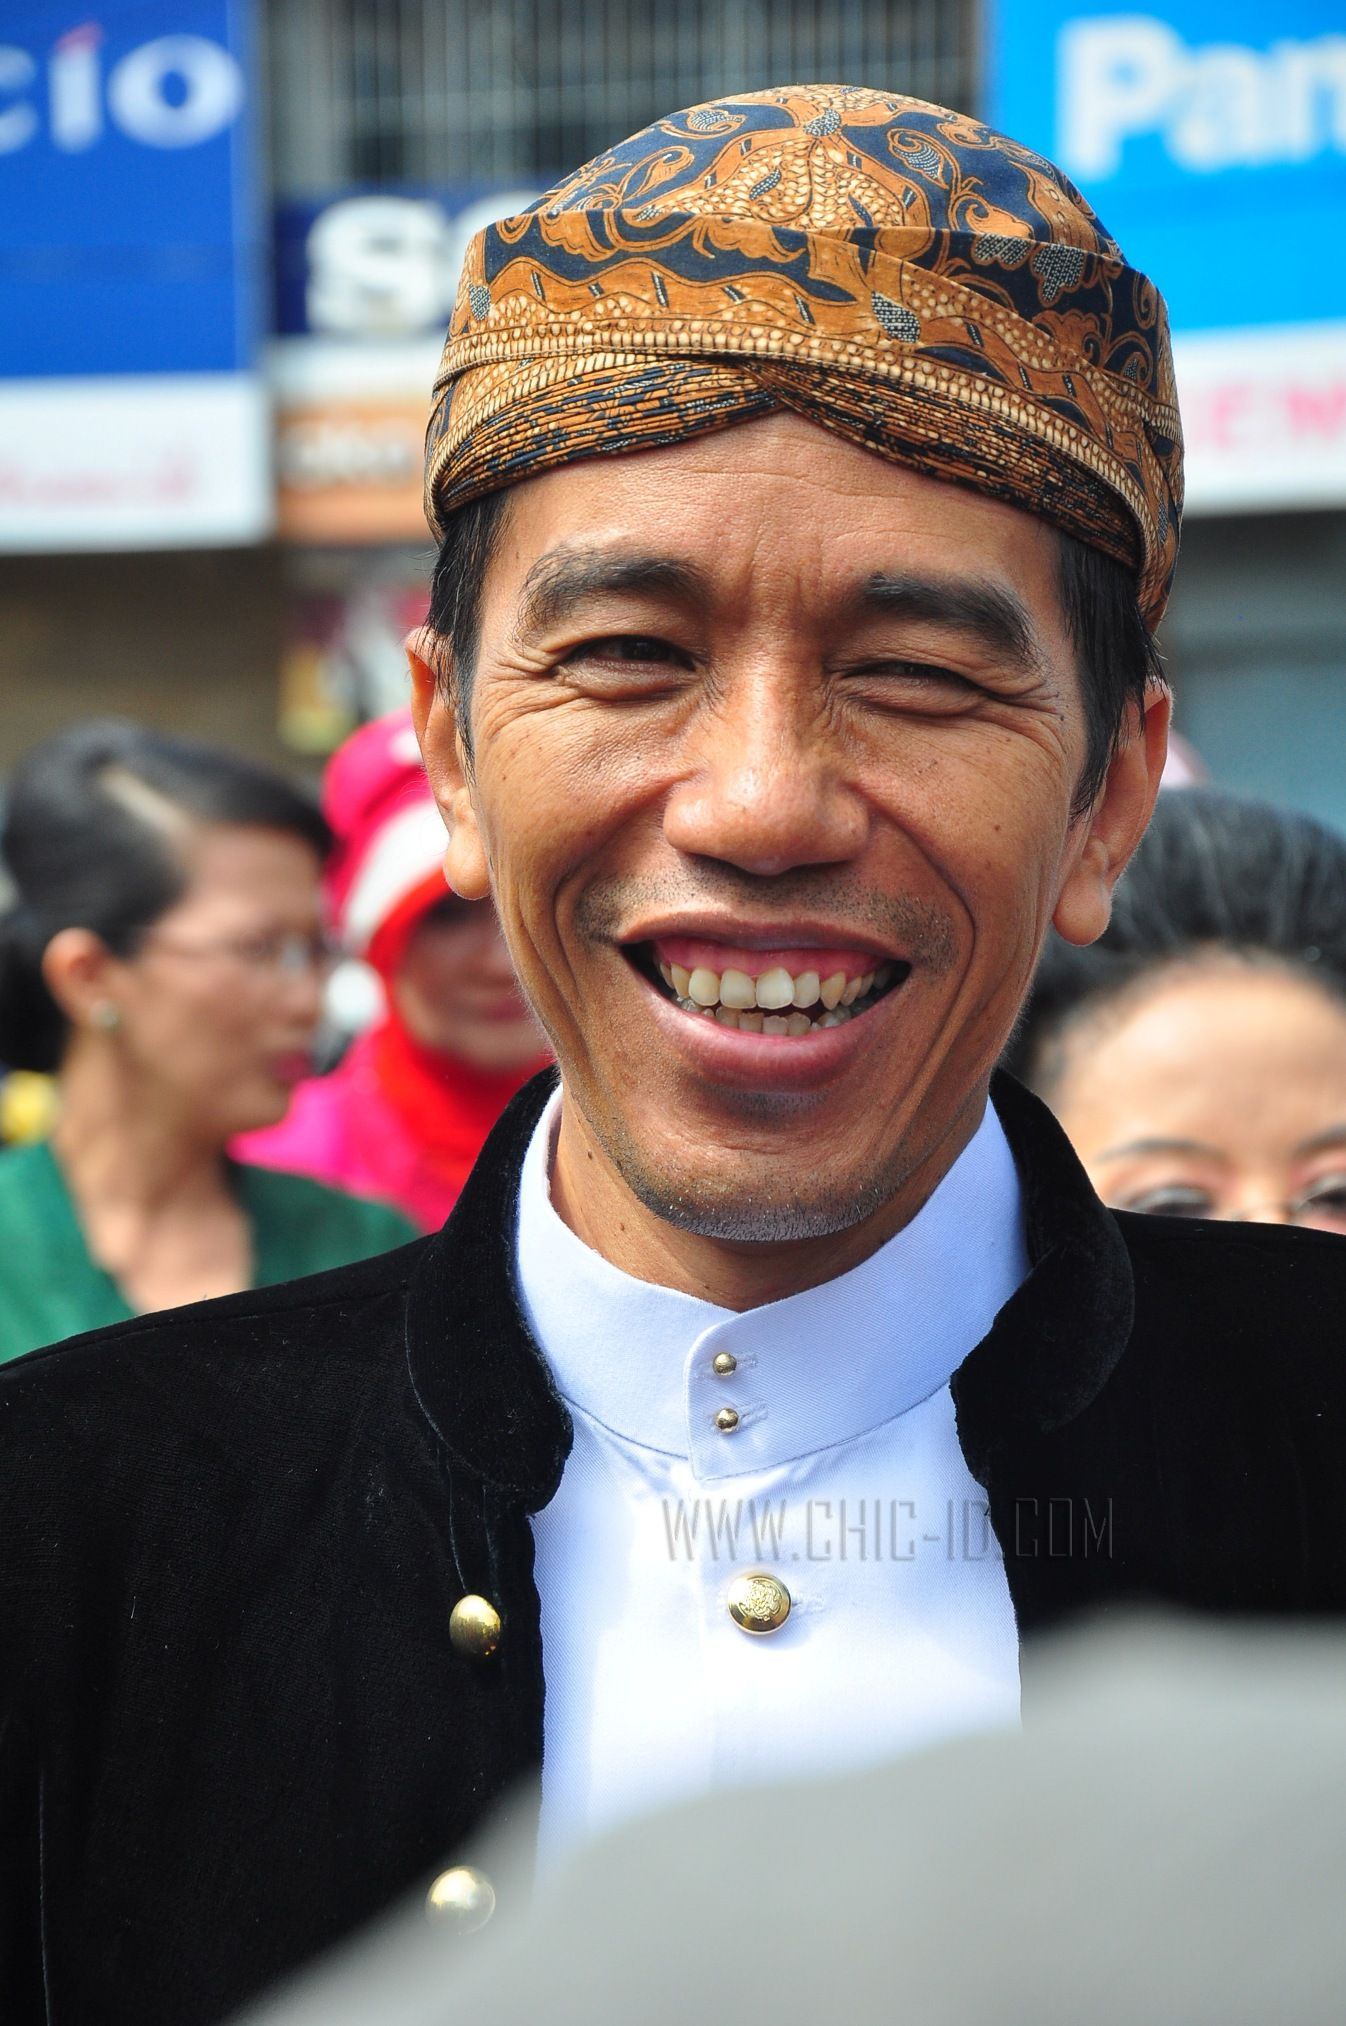 Walikota Solo Surakarta Ir Joko Widodo masuk dalam